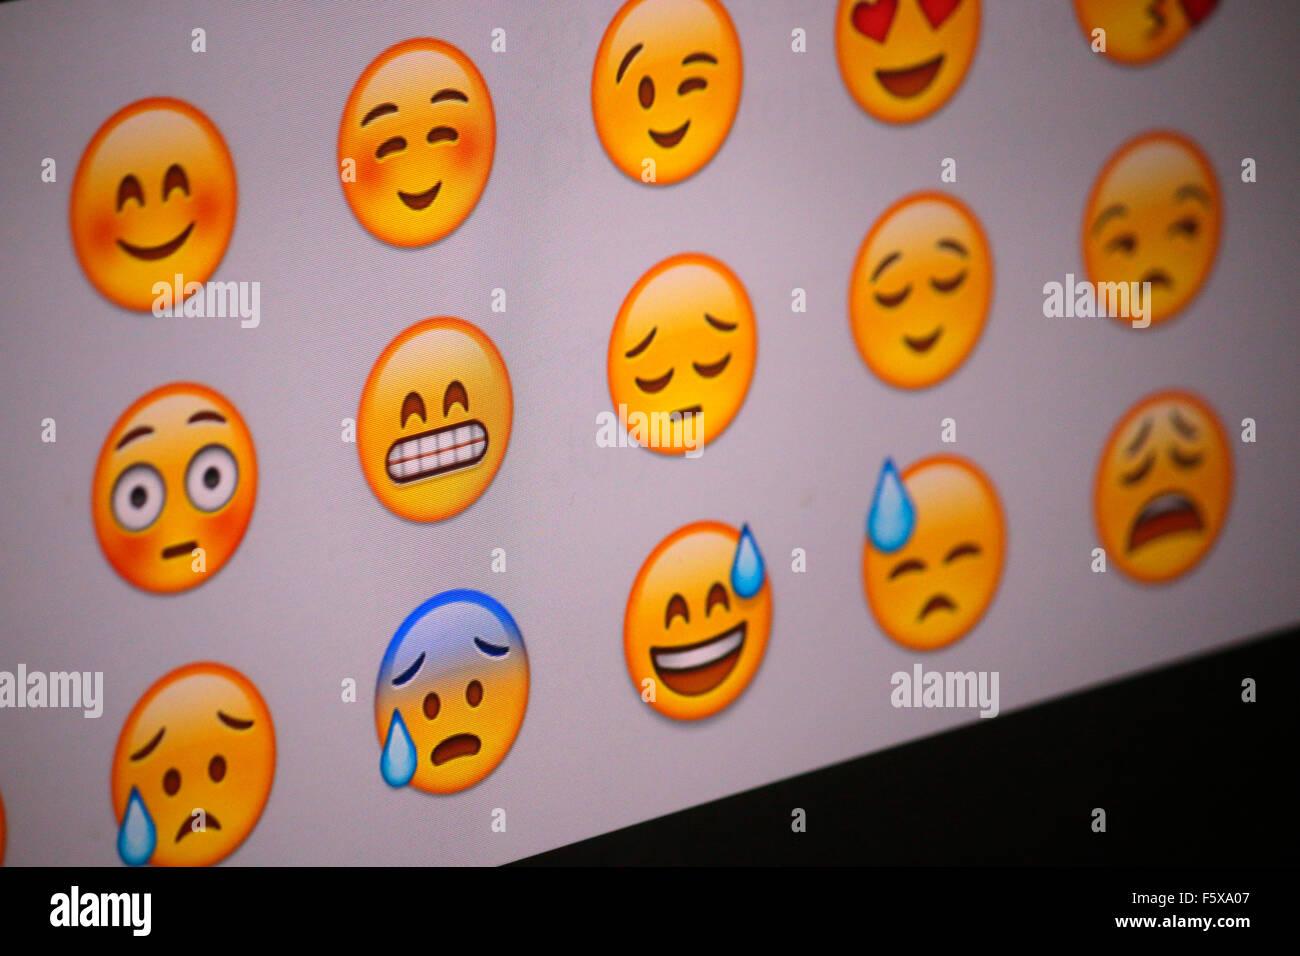 'Emoji', Berlin. - Stock Image